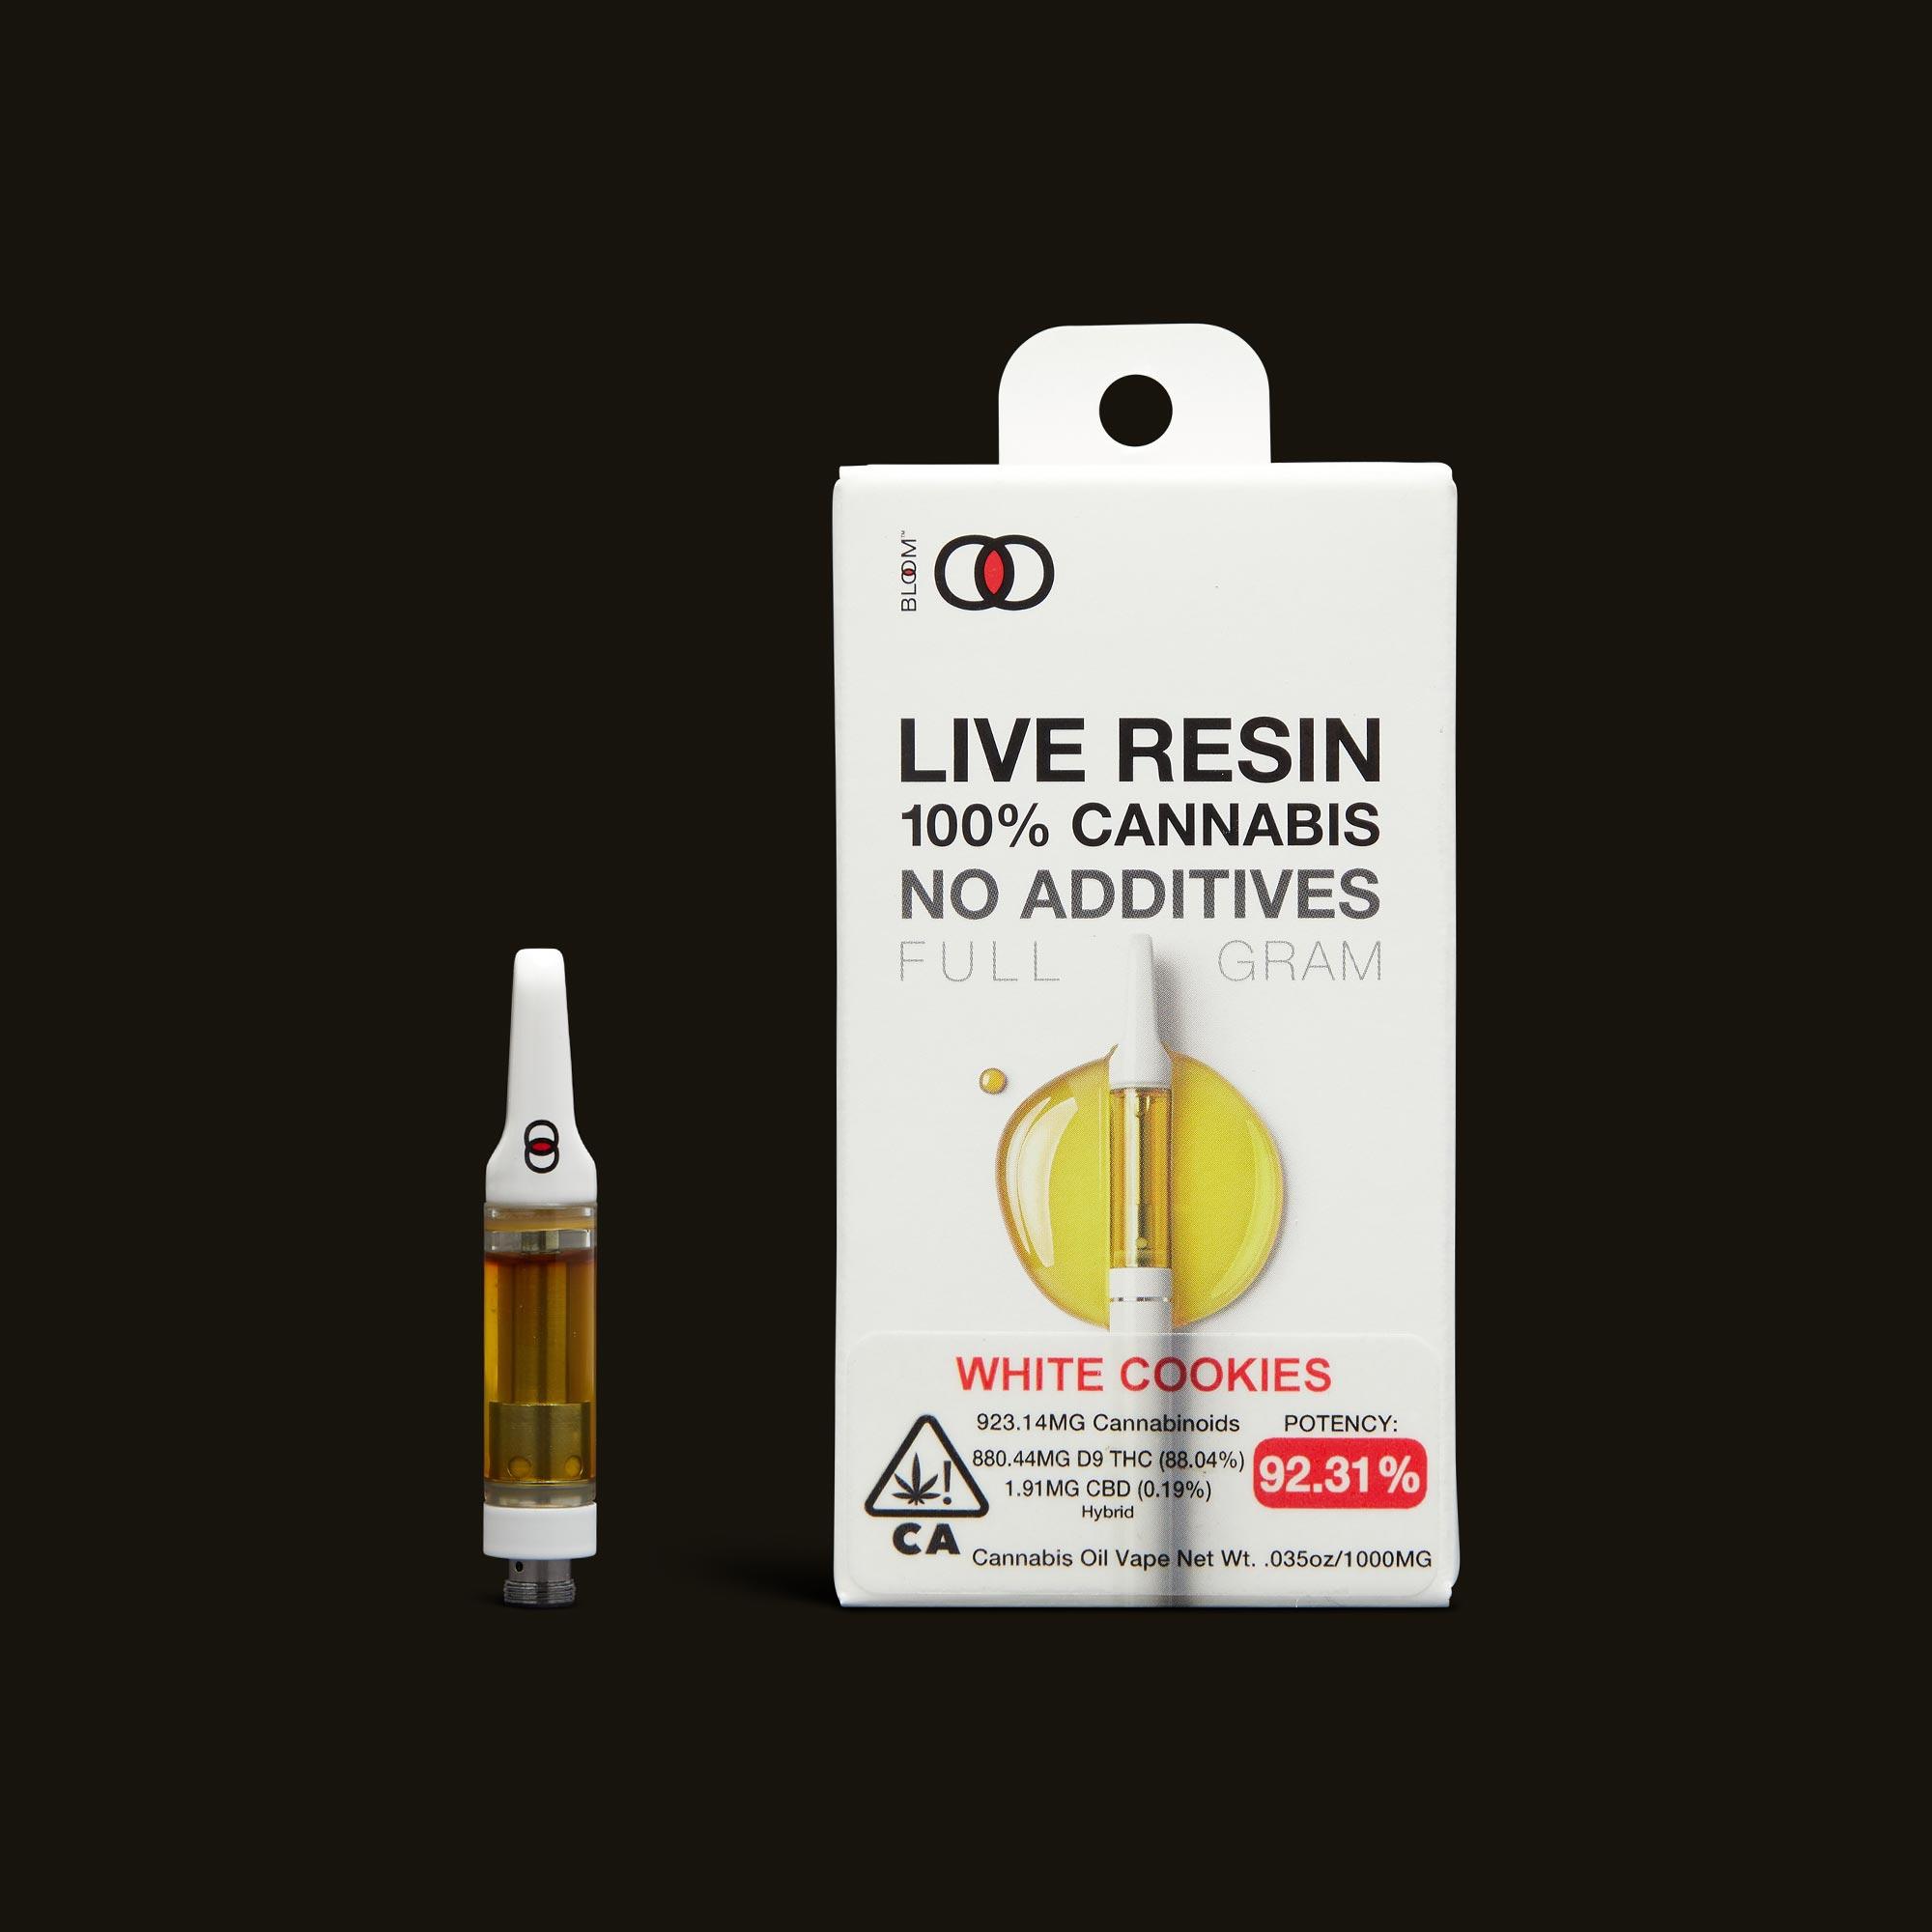 Bloom Brands White Cookies Live Resin Cartridge - 1g